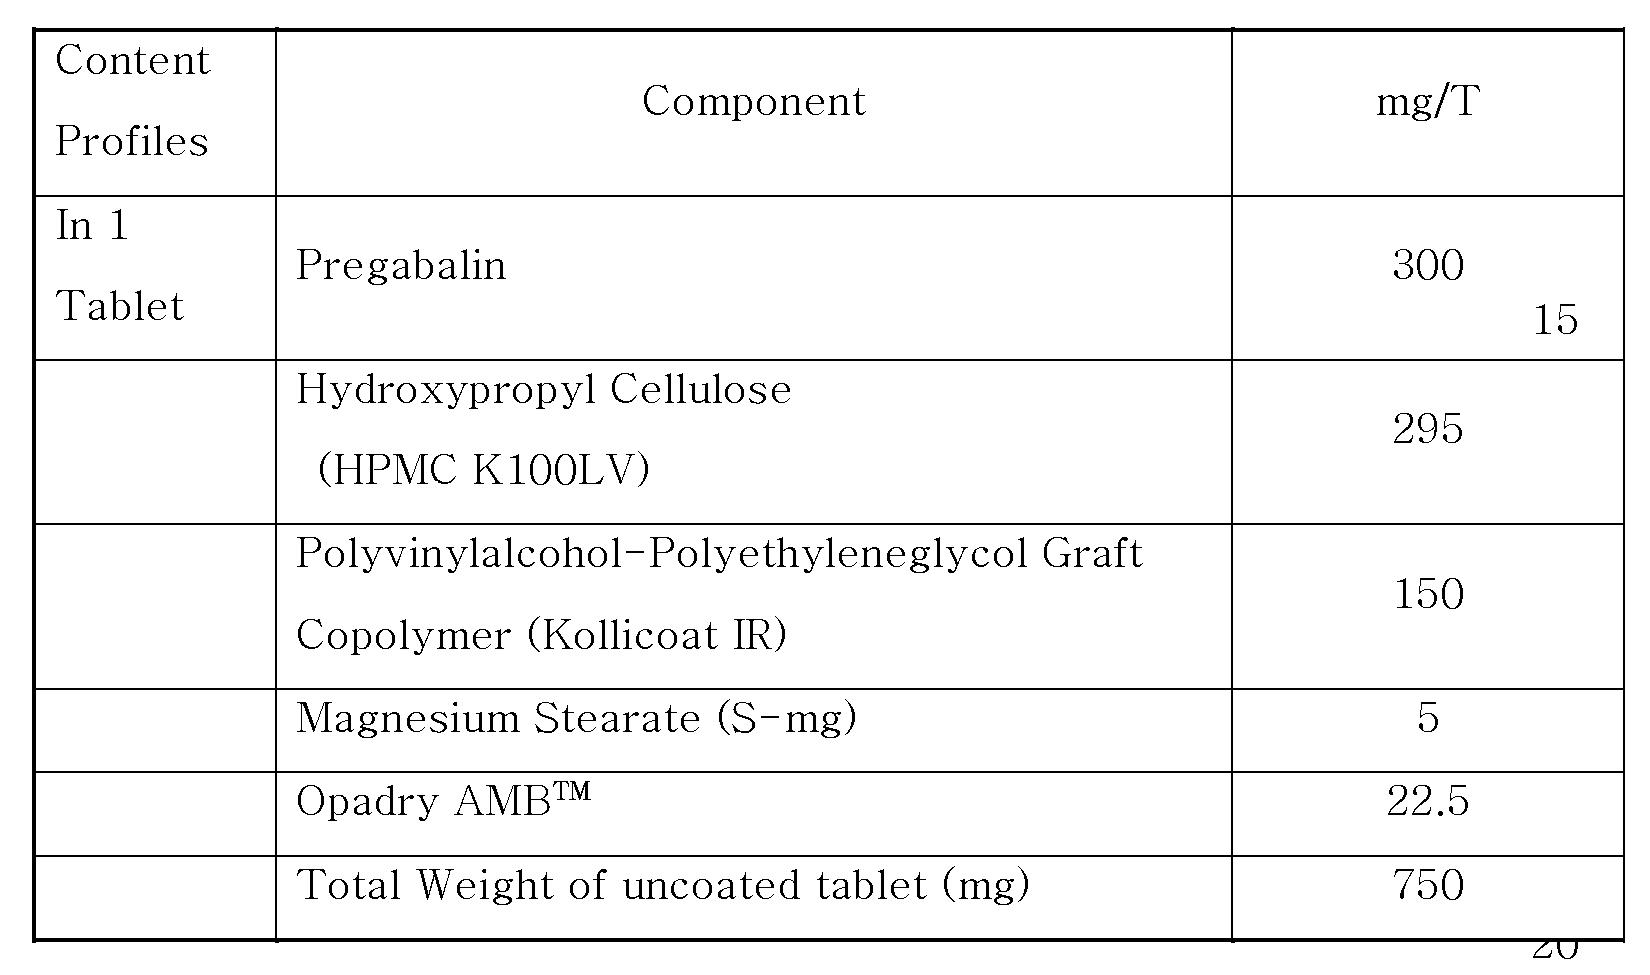 pregabalin 75 mg sustained release formulation